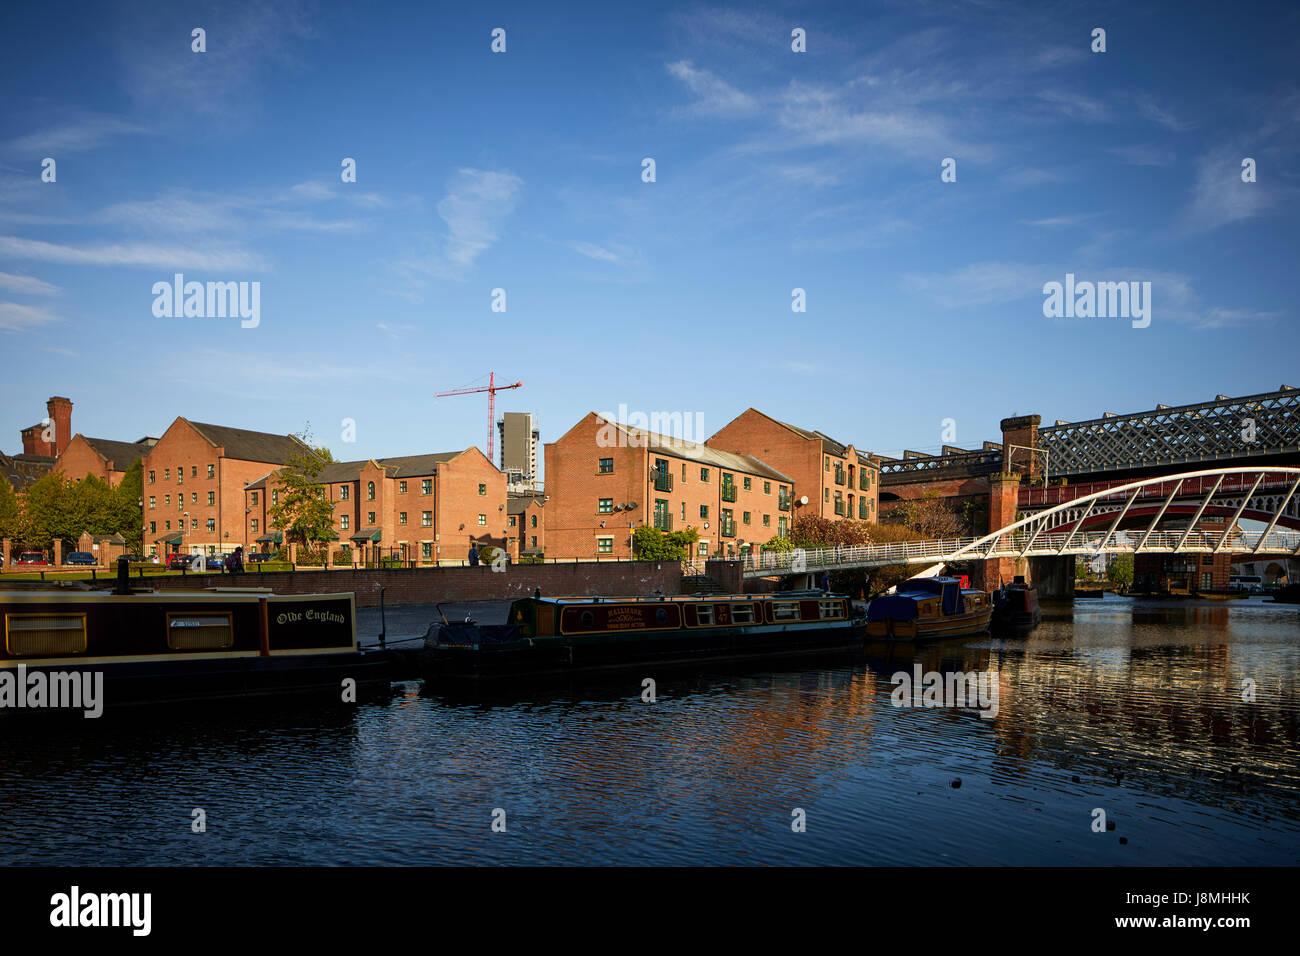 Manchester castlefield basin, and modern urban housing development, - Stock Image